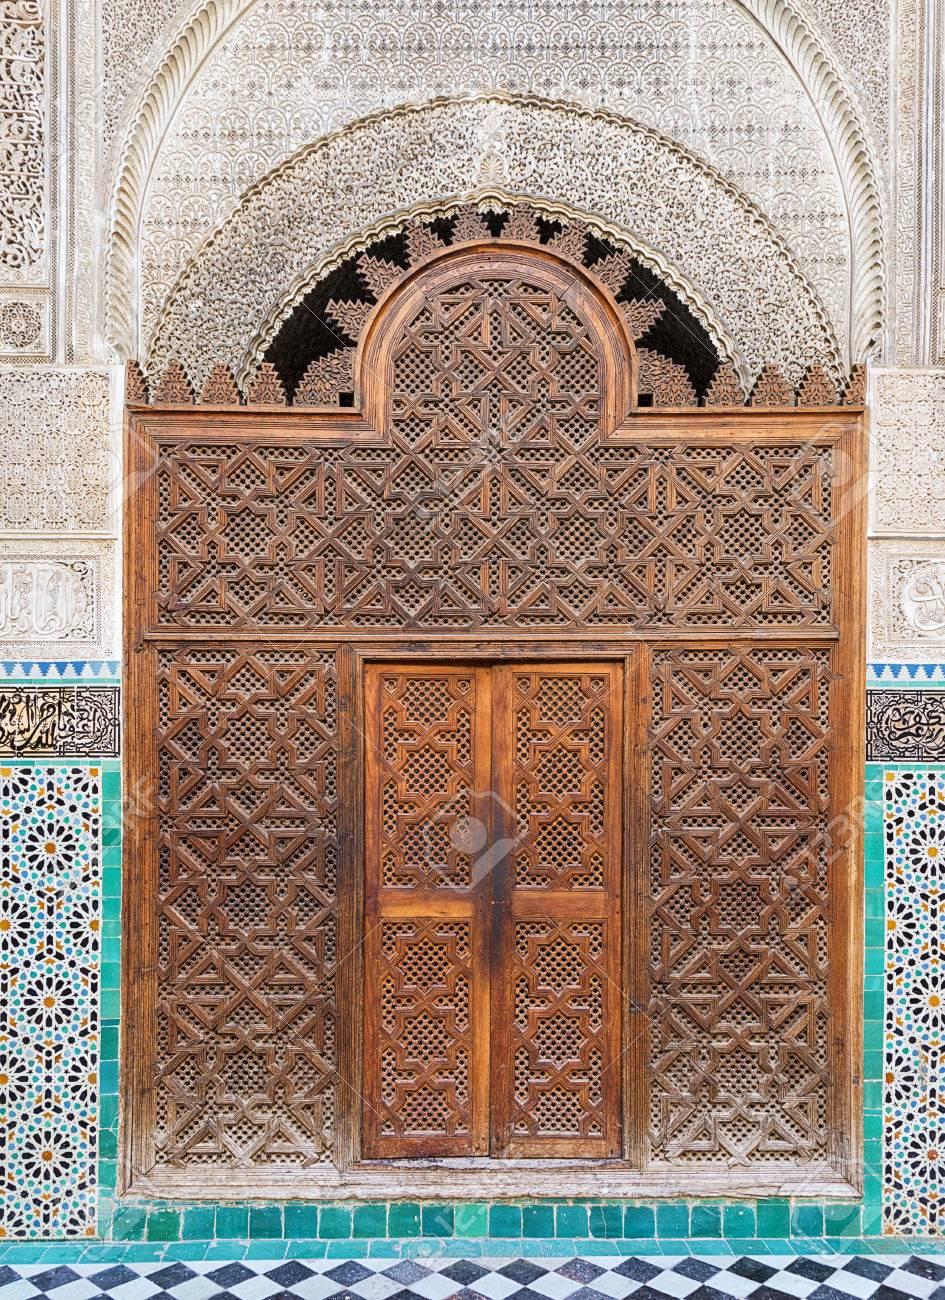 Ancient oriental wooden door in Fes Morocco. Stock Photo - 46095001 & Ancient Oriental Wooden Door In Fes Morocco. Stock Photo Picture ...